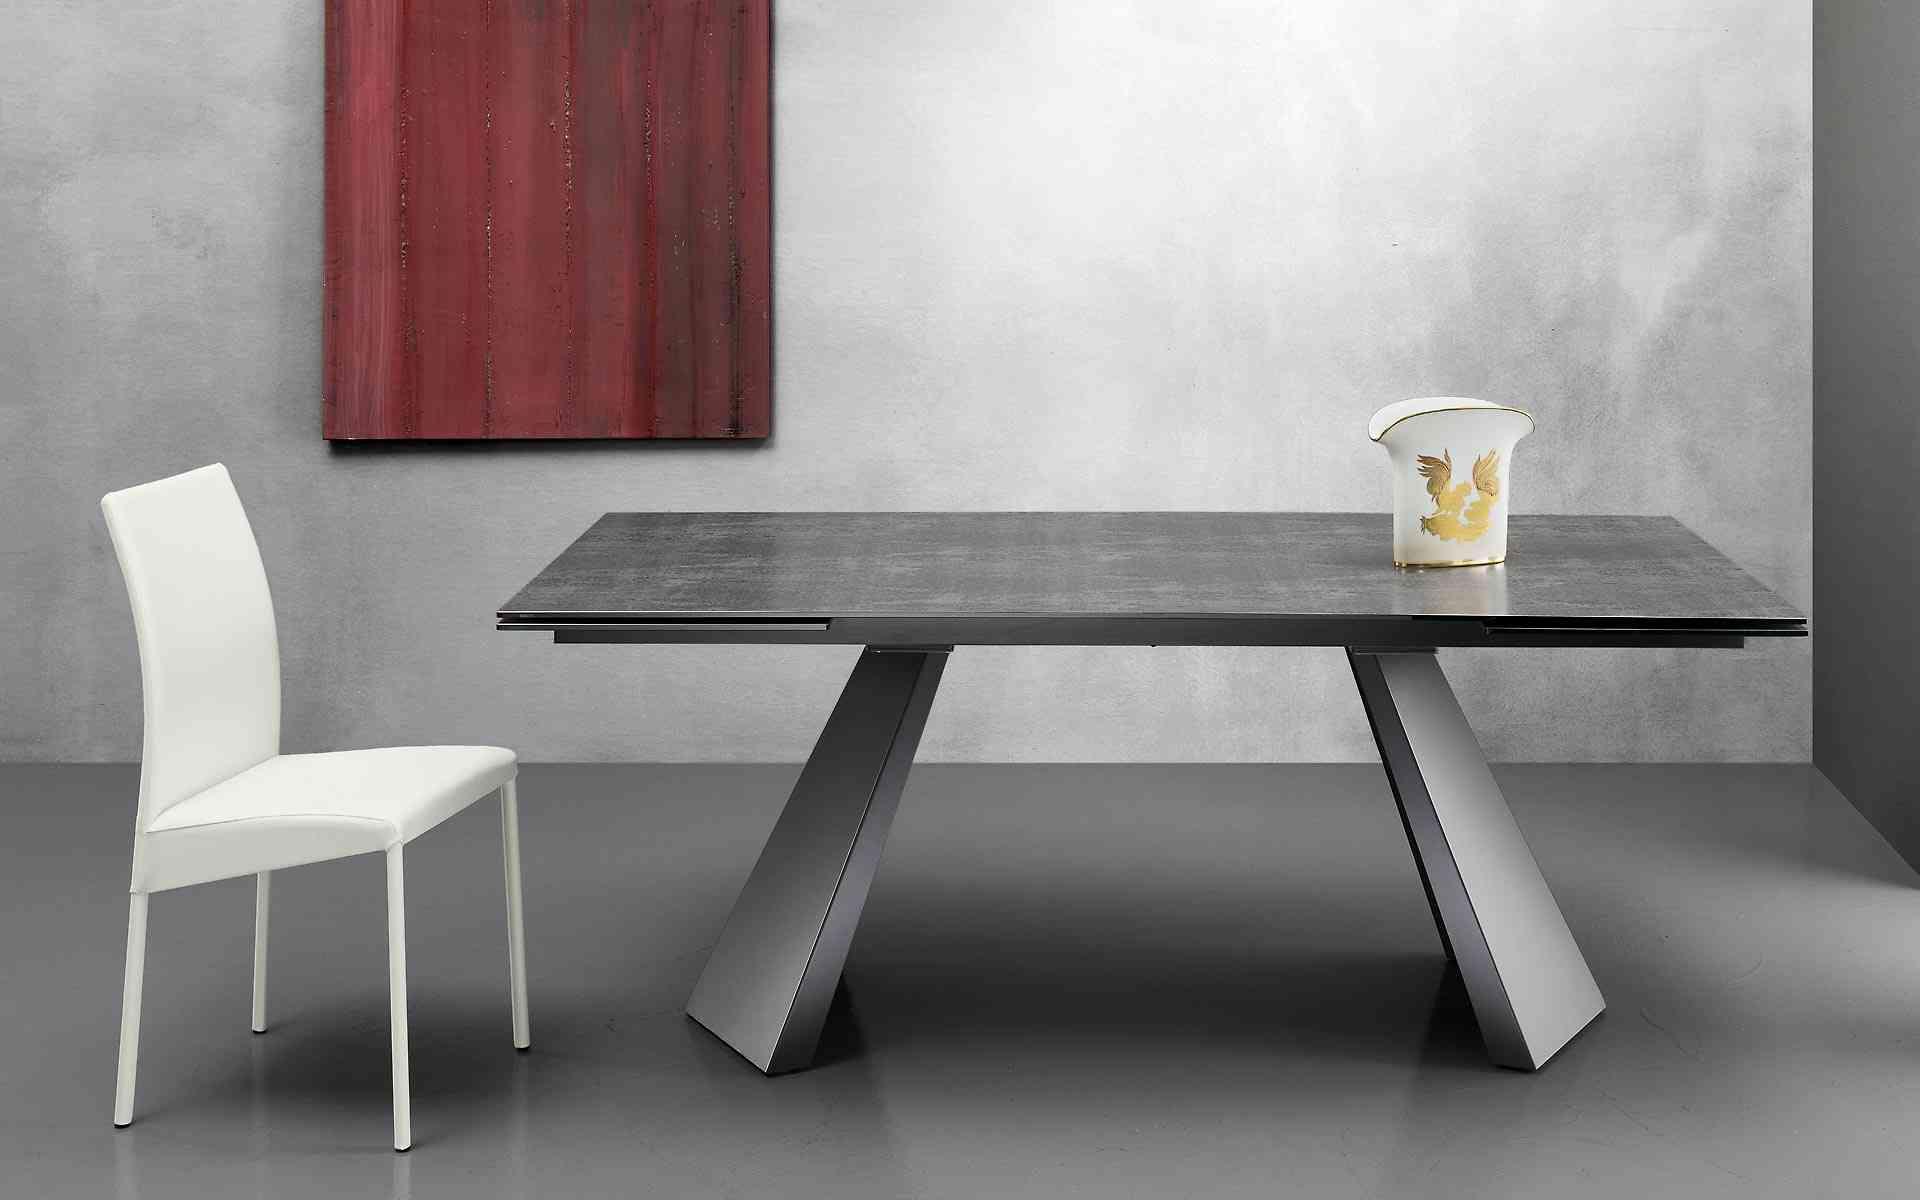 Eurosedia sedie sgabelli tavoli home office for Sedie in ferro design